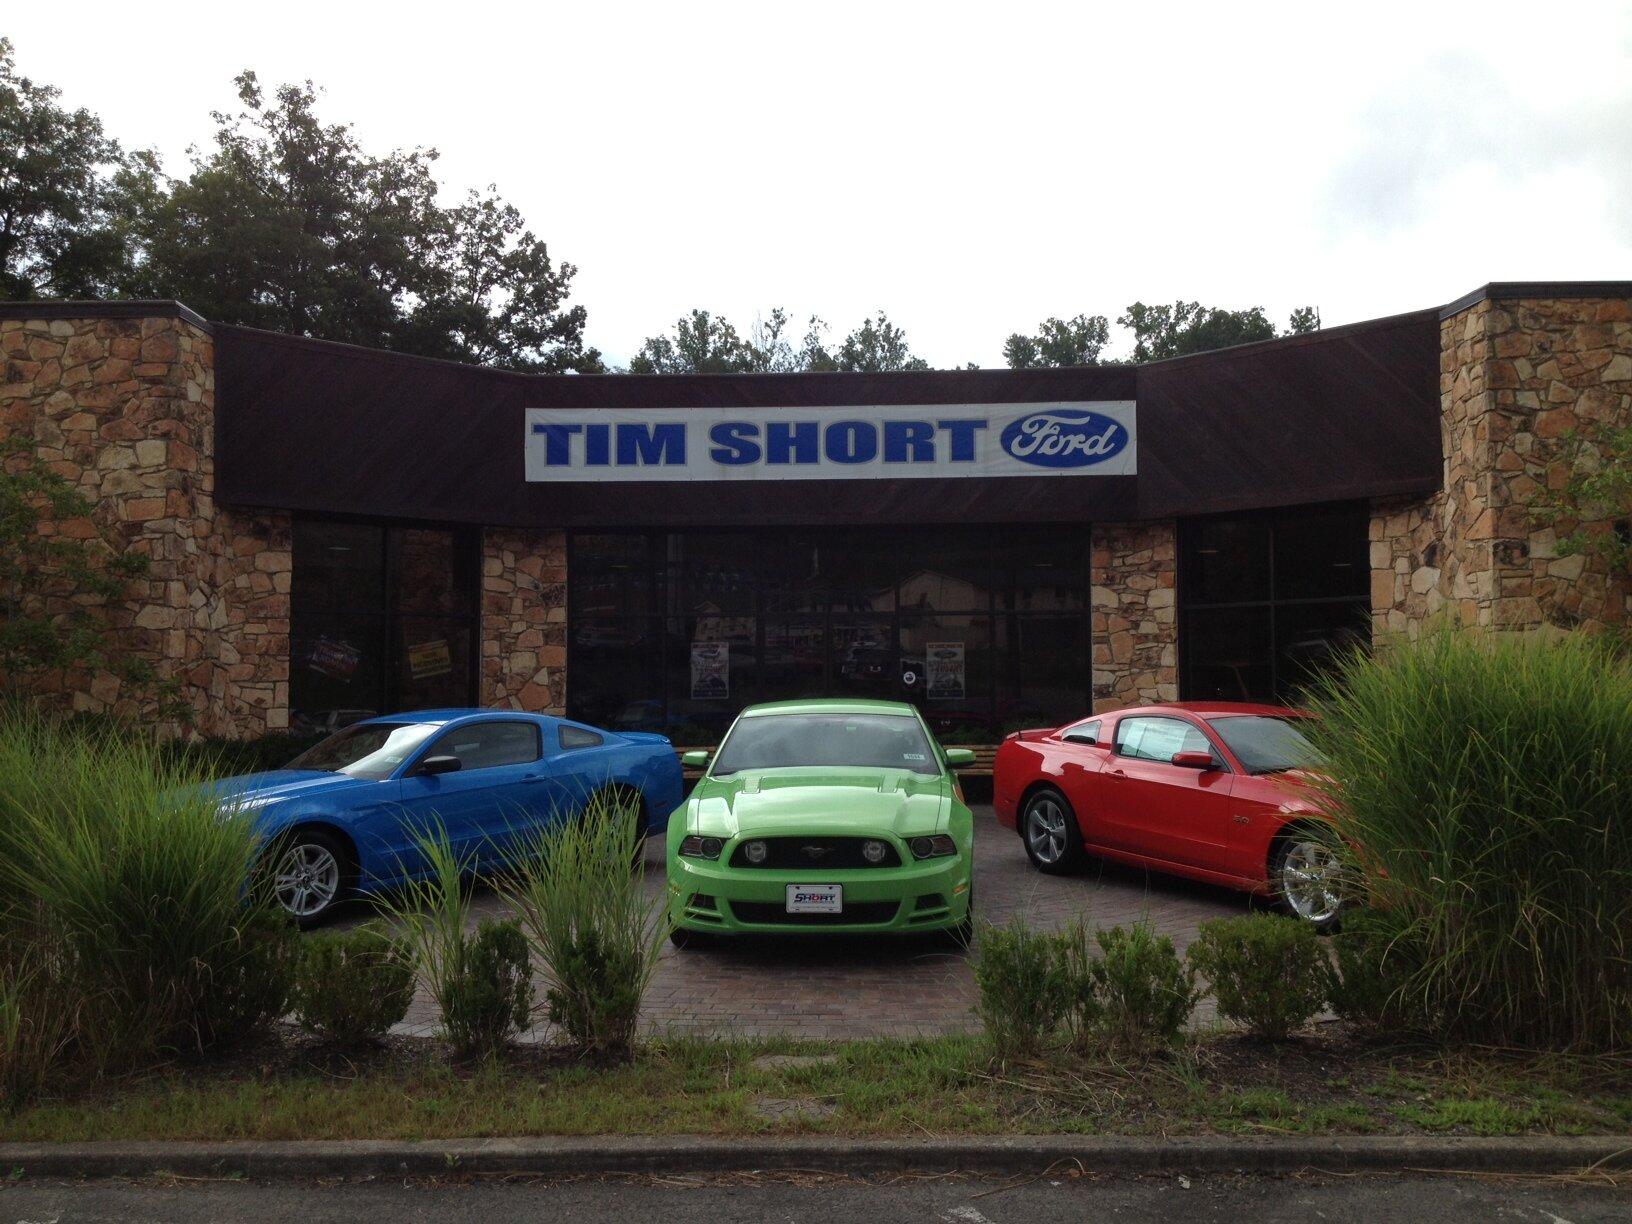 Tim Short Ford >> Tim Short Ford Timshortford1 Twitter